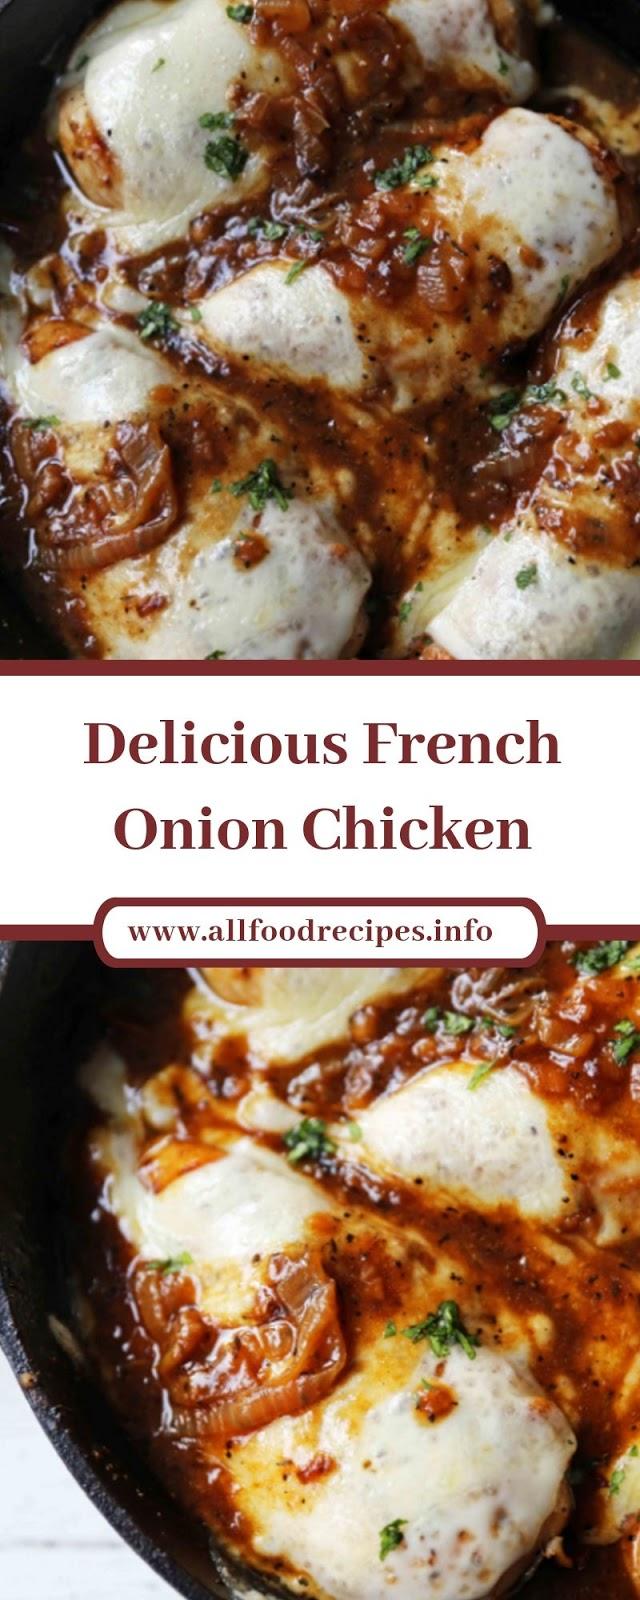 Delicious French Onion Chicken